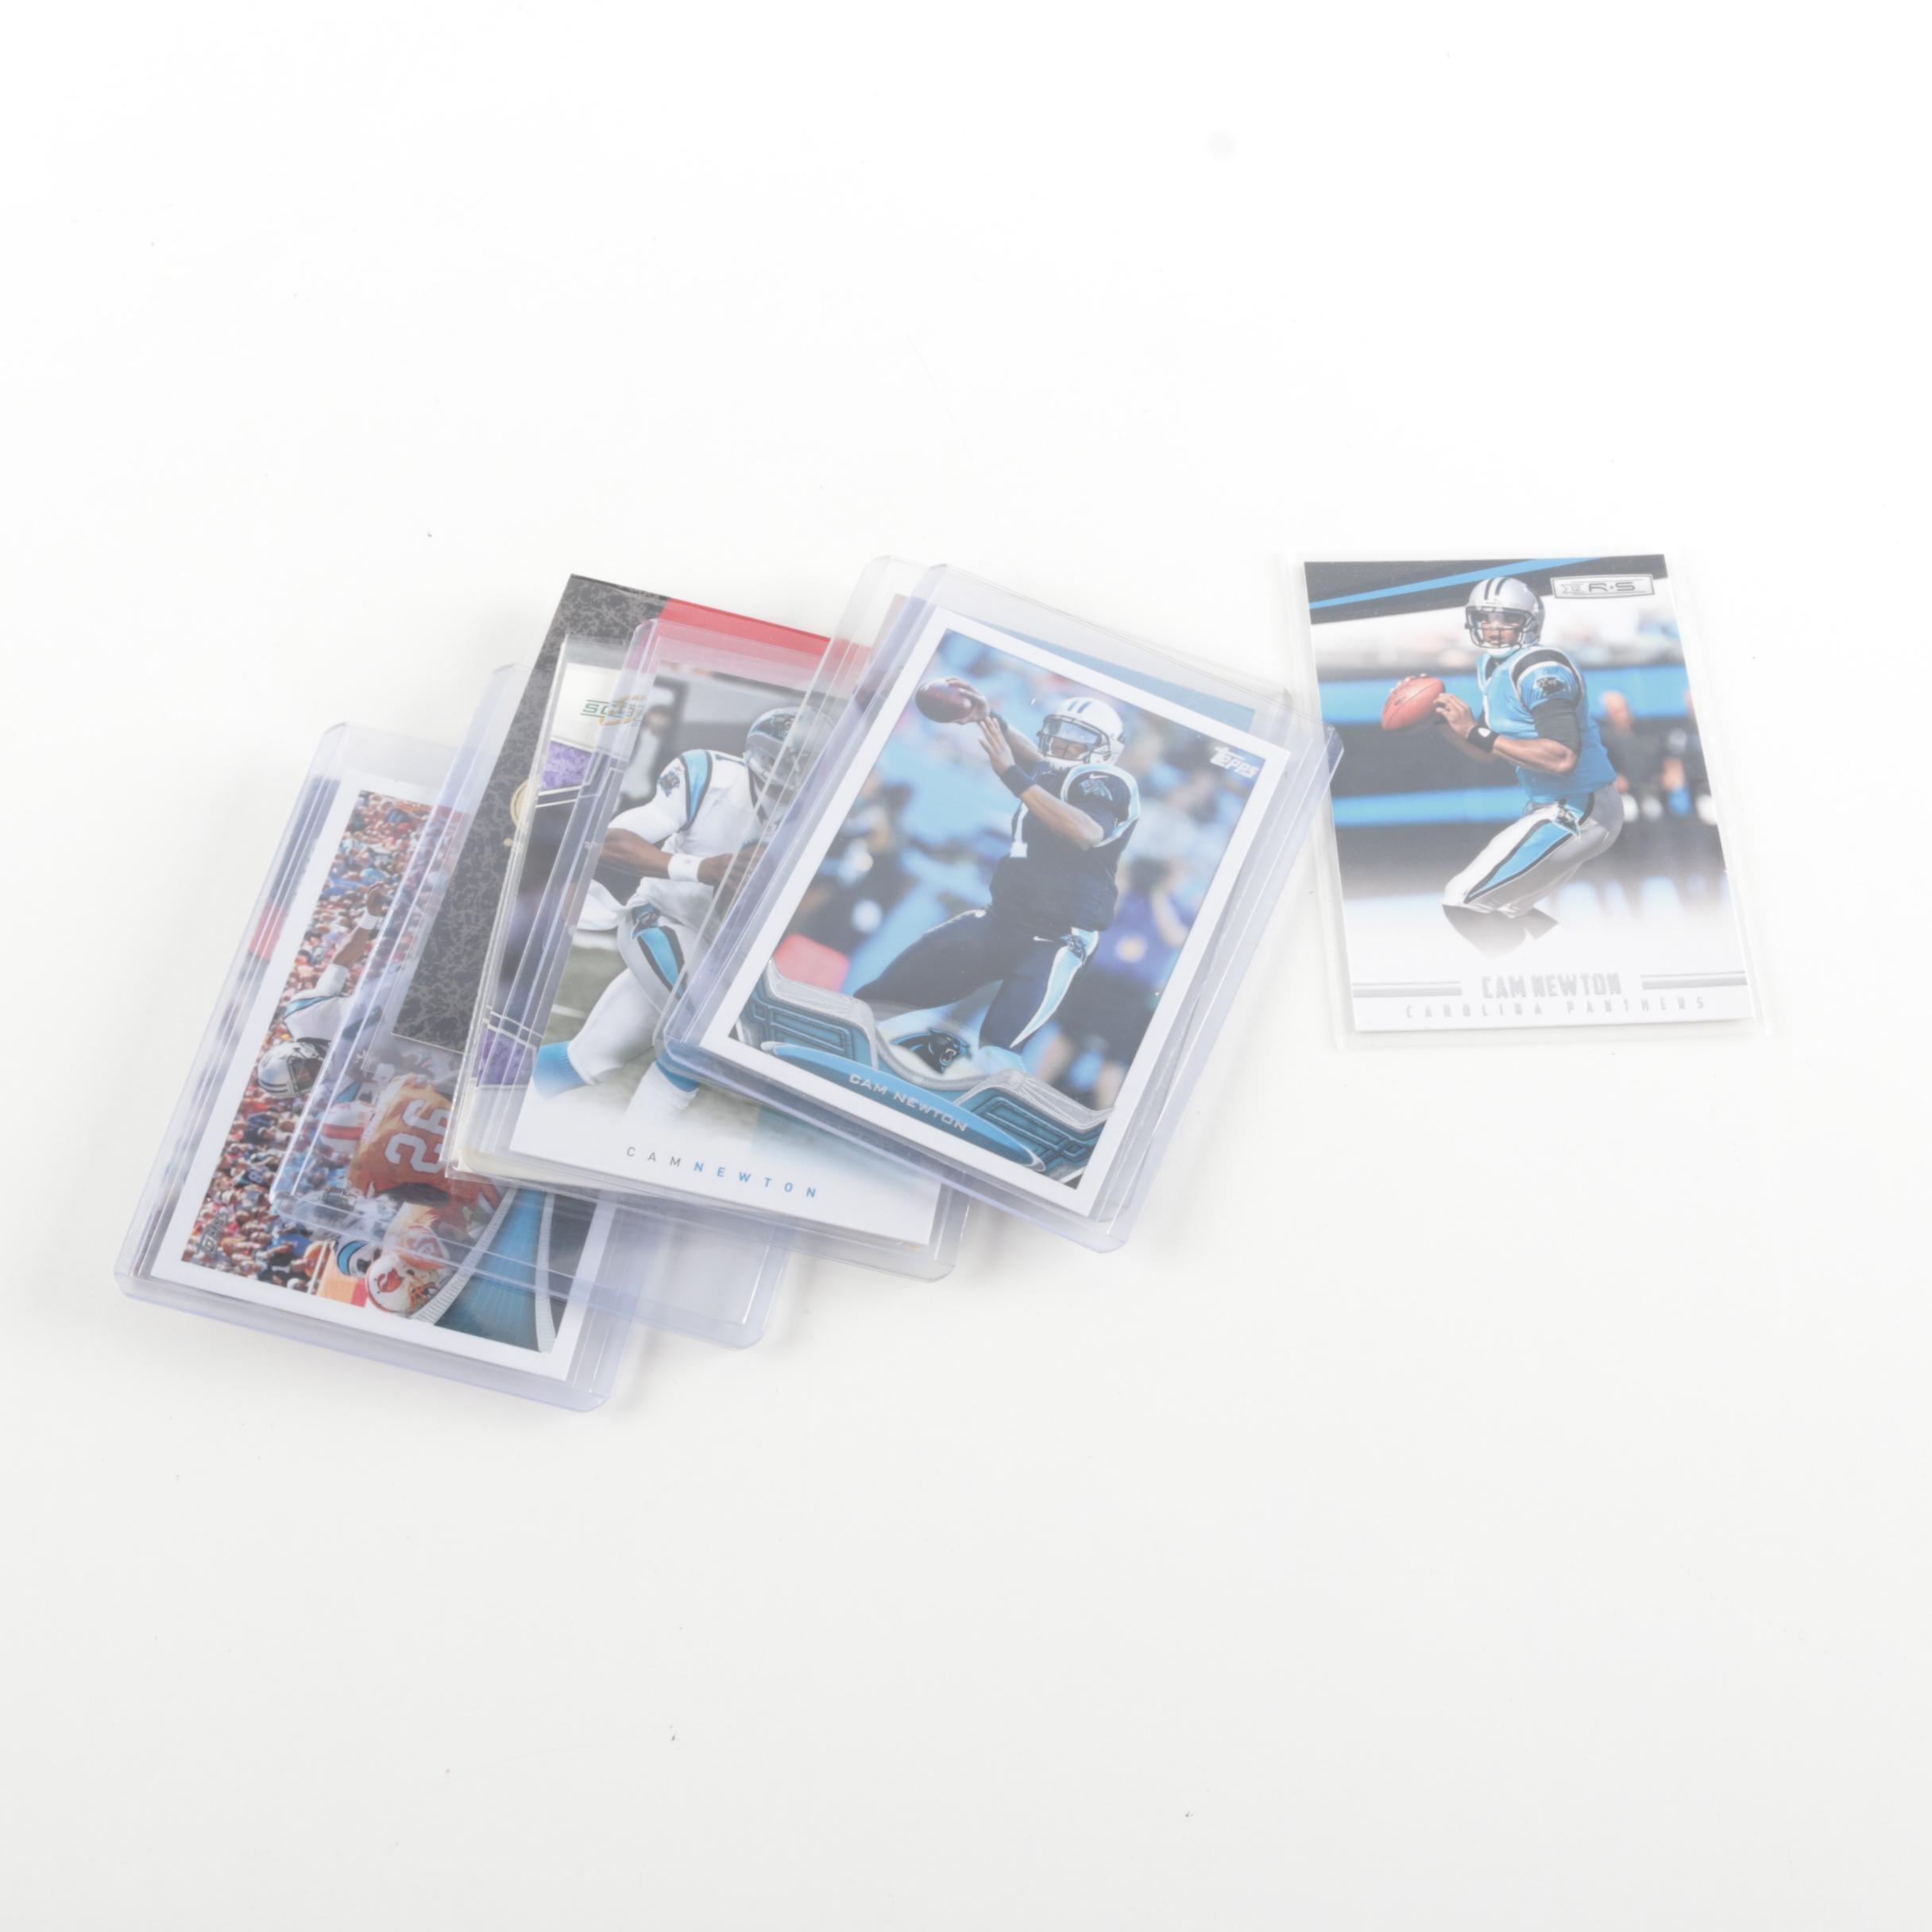 Football Card Assortment Including Champ Bailey Captain's Patch Card